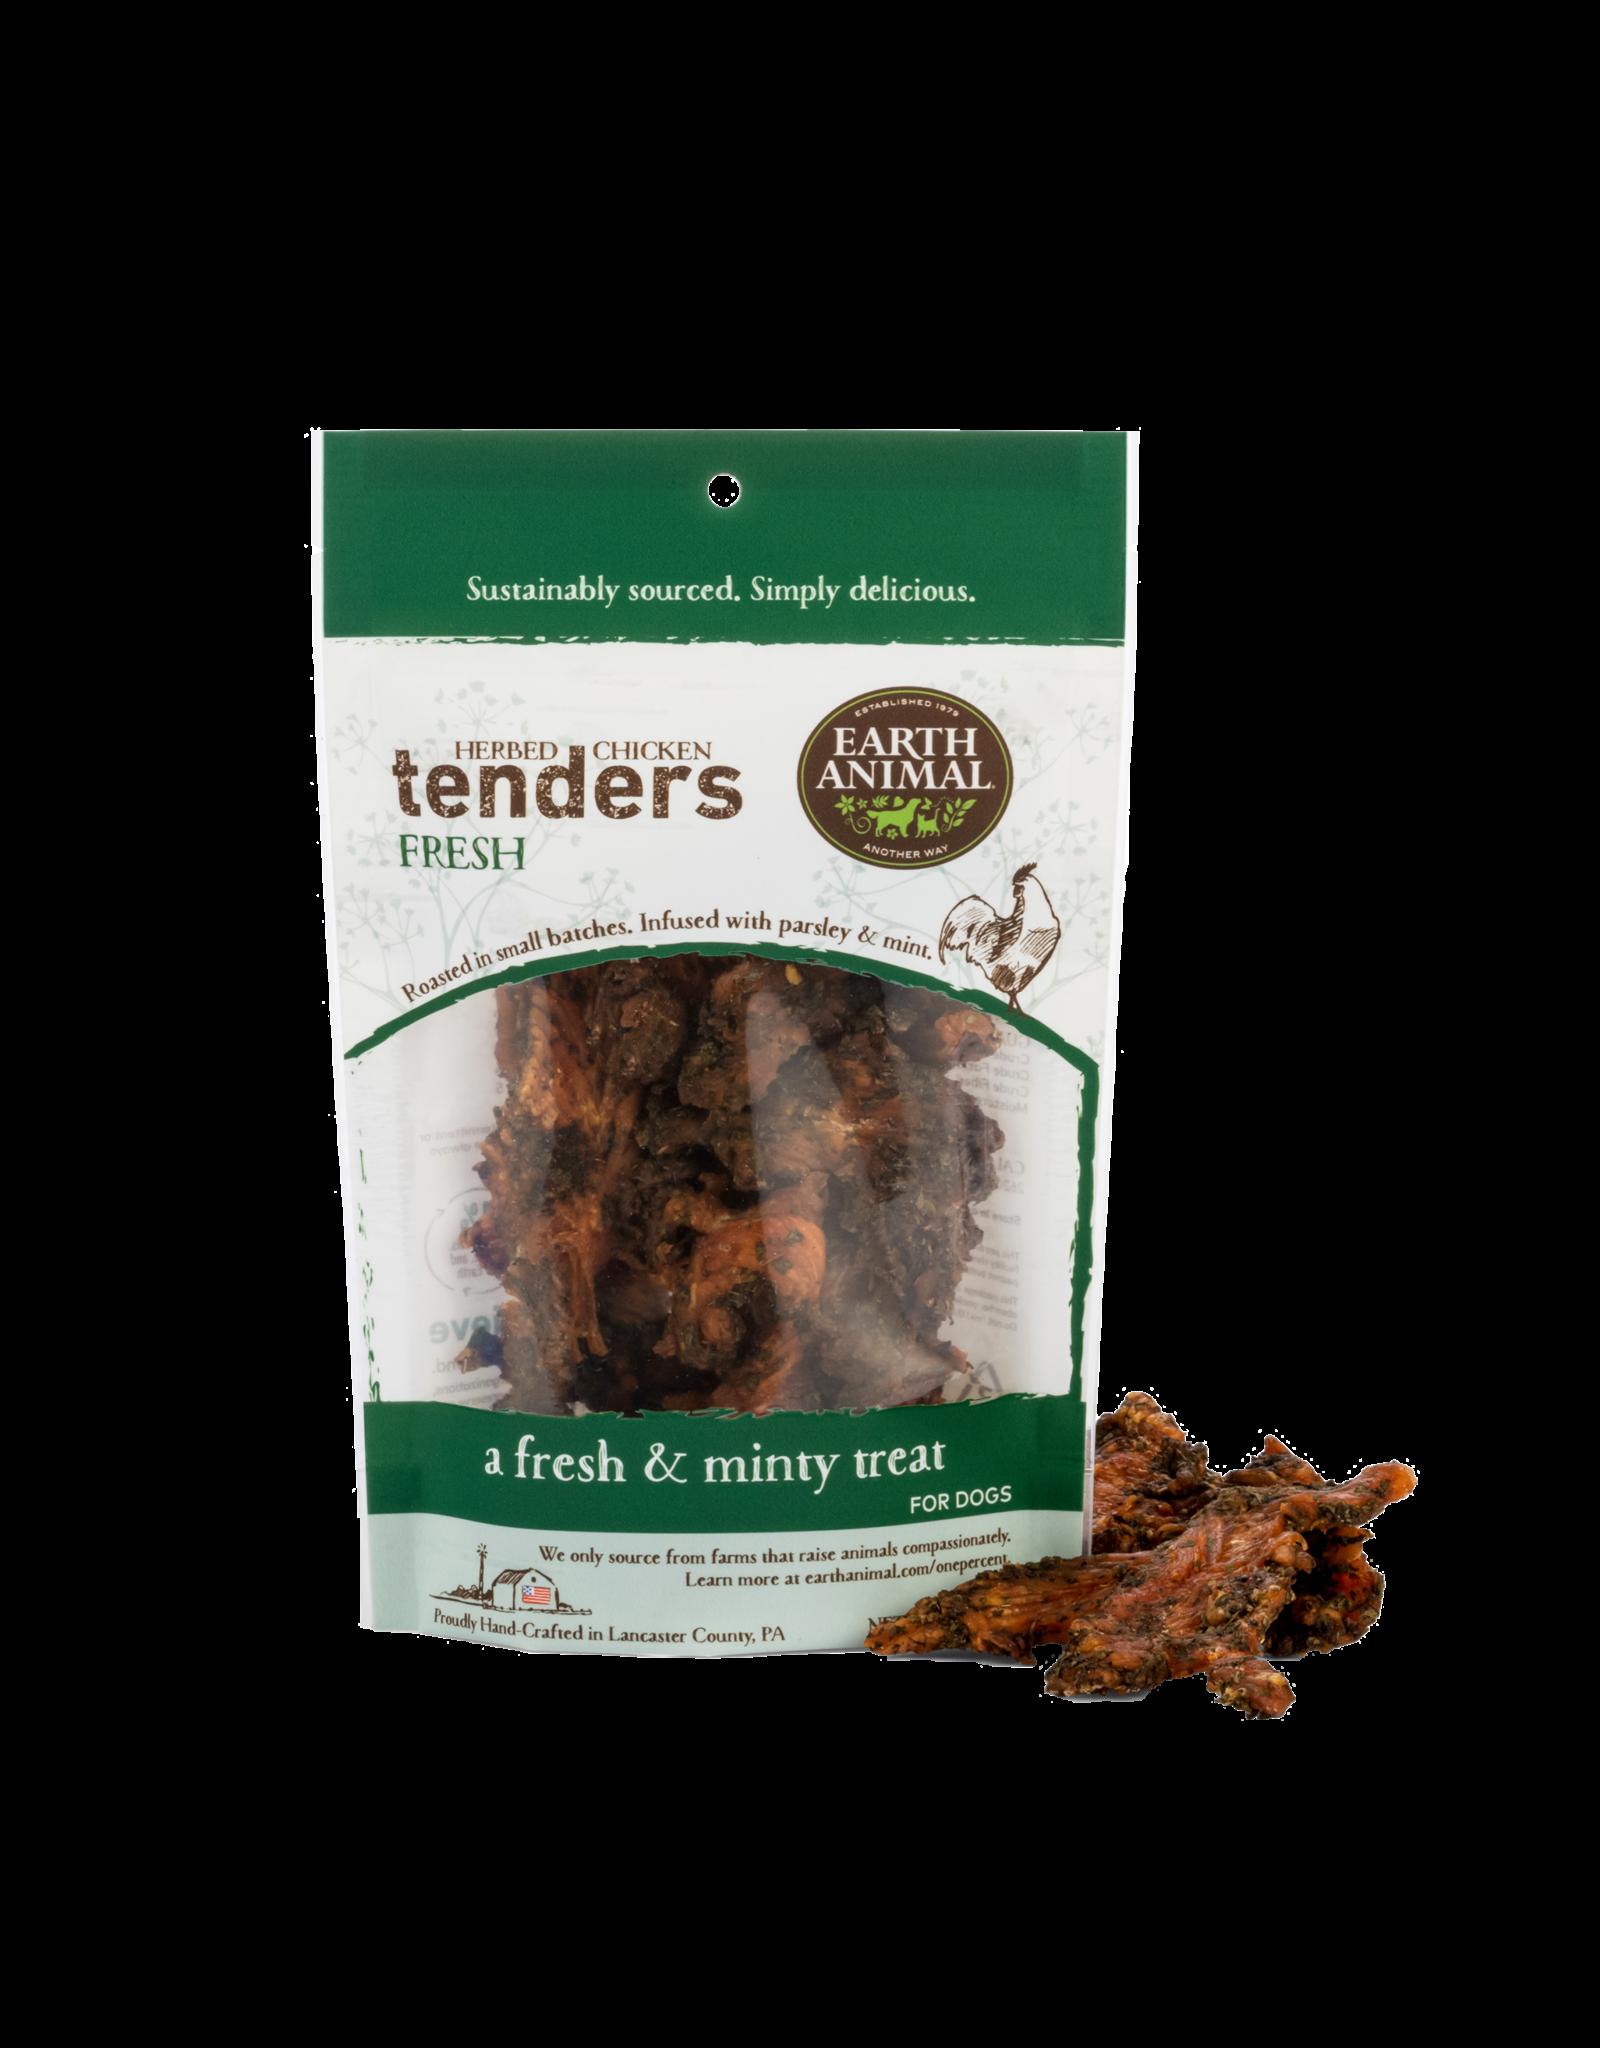 Earth Animal Earth Animal Chicken Tenders: Fresh, Parsley & Mint